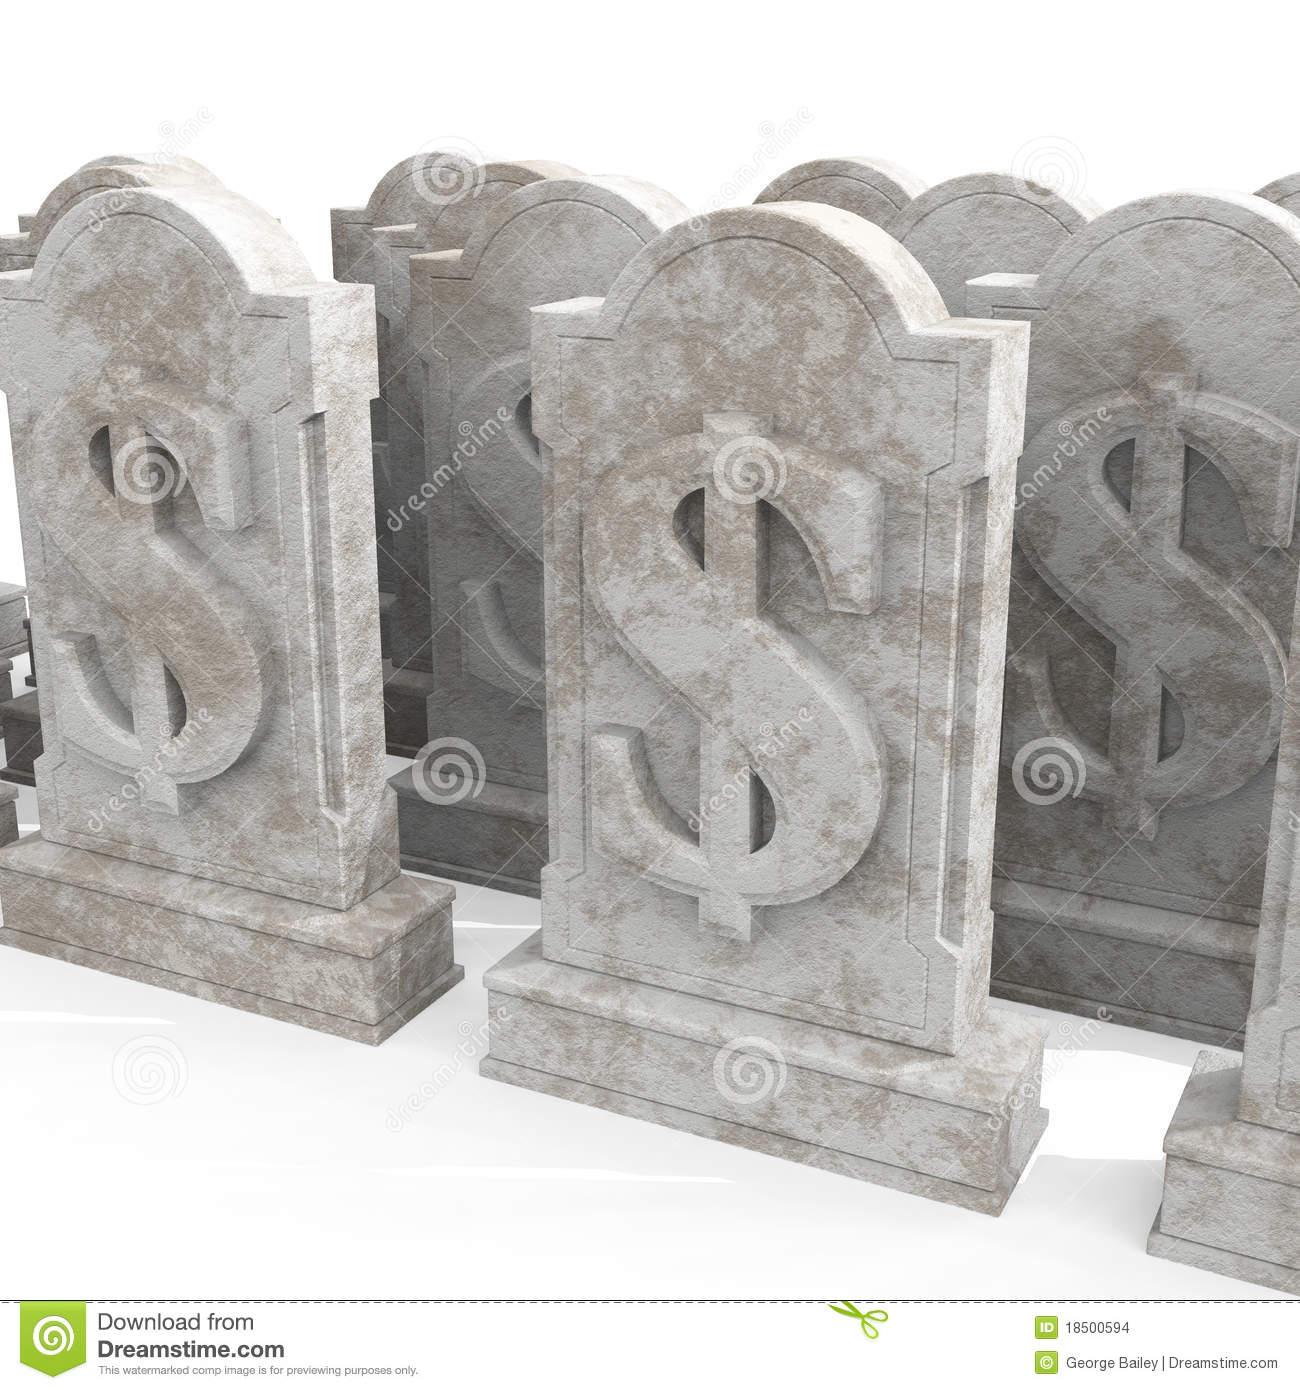 muerte-del-dólar-18500594